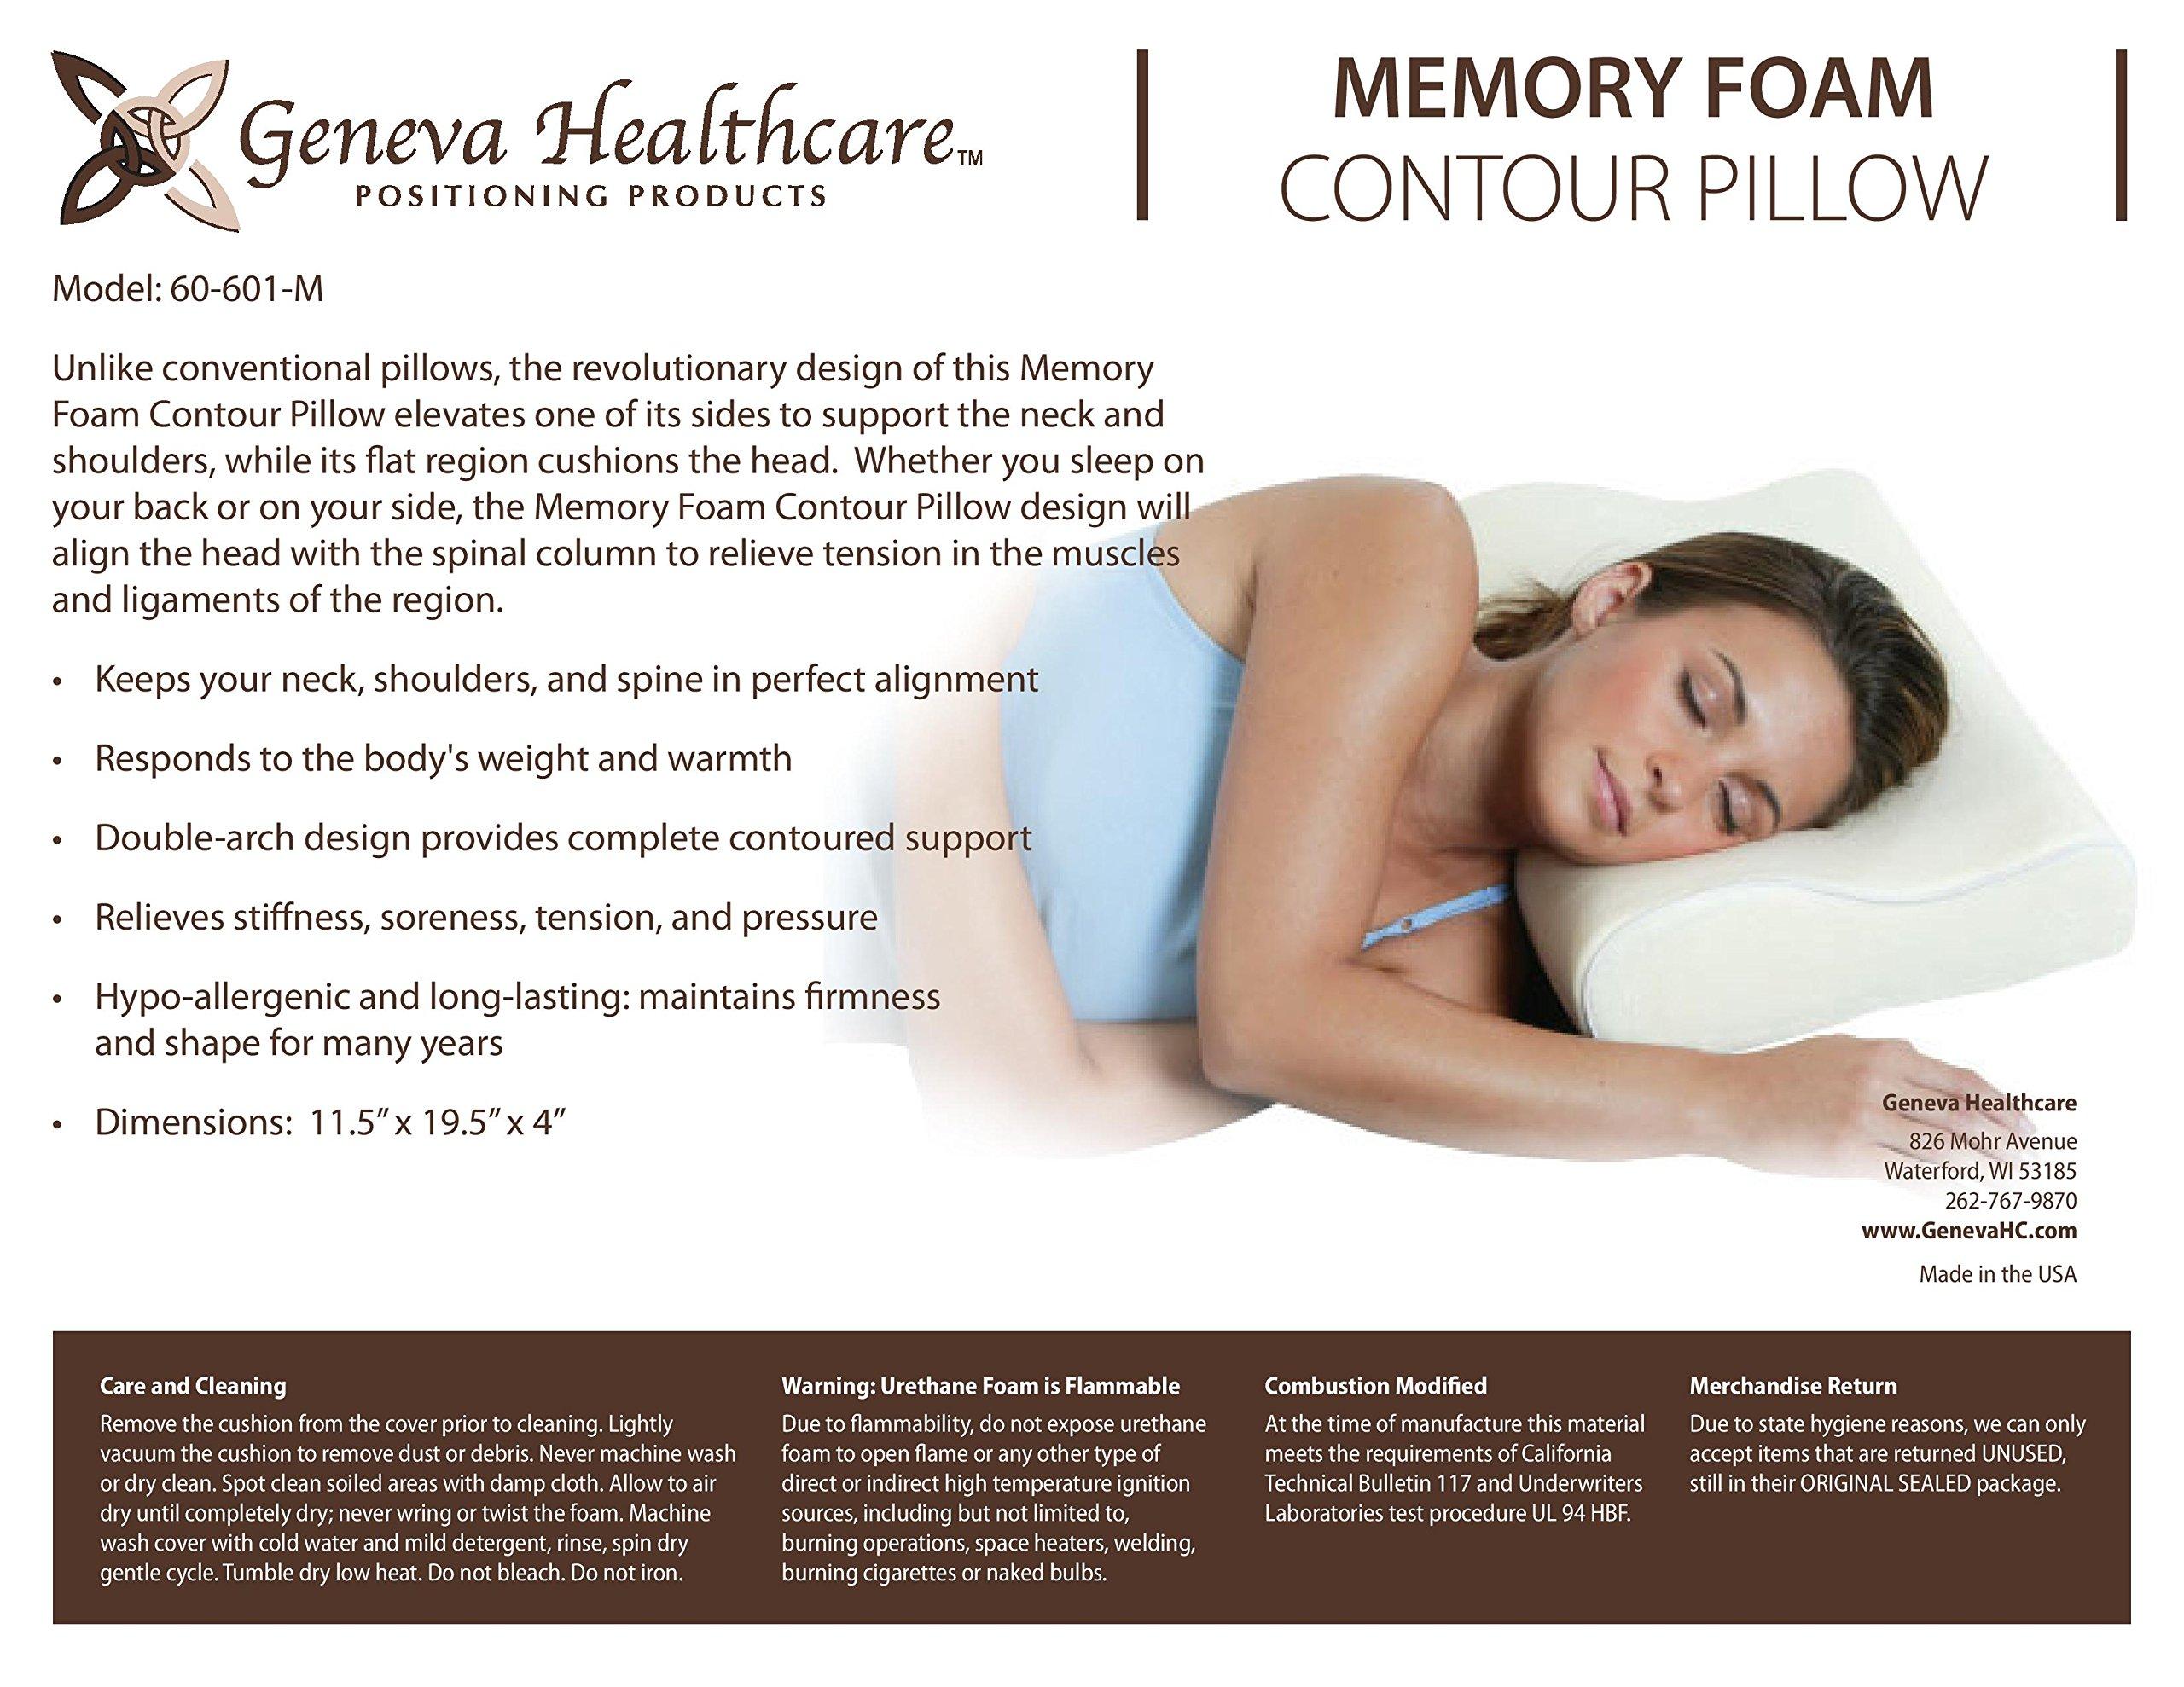 Geneva Healthcare Memory Foam Contour Pillow - 4'' x 12'' x 19'' - 1/EA